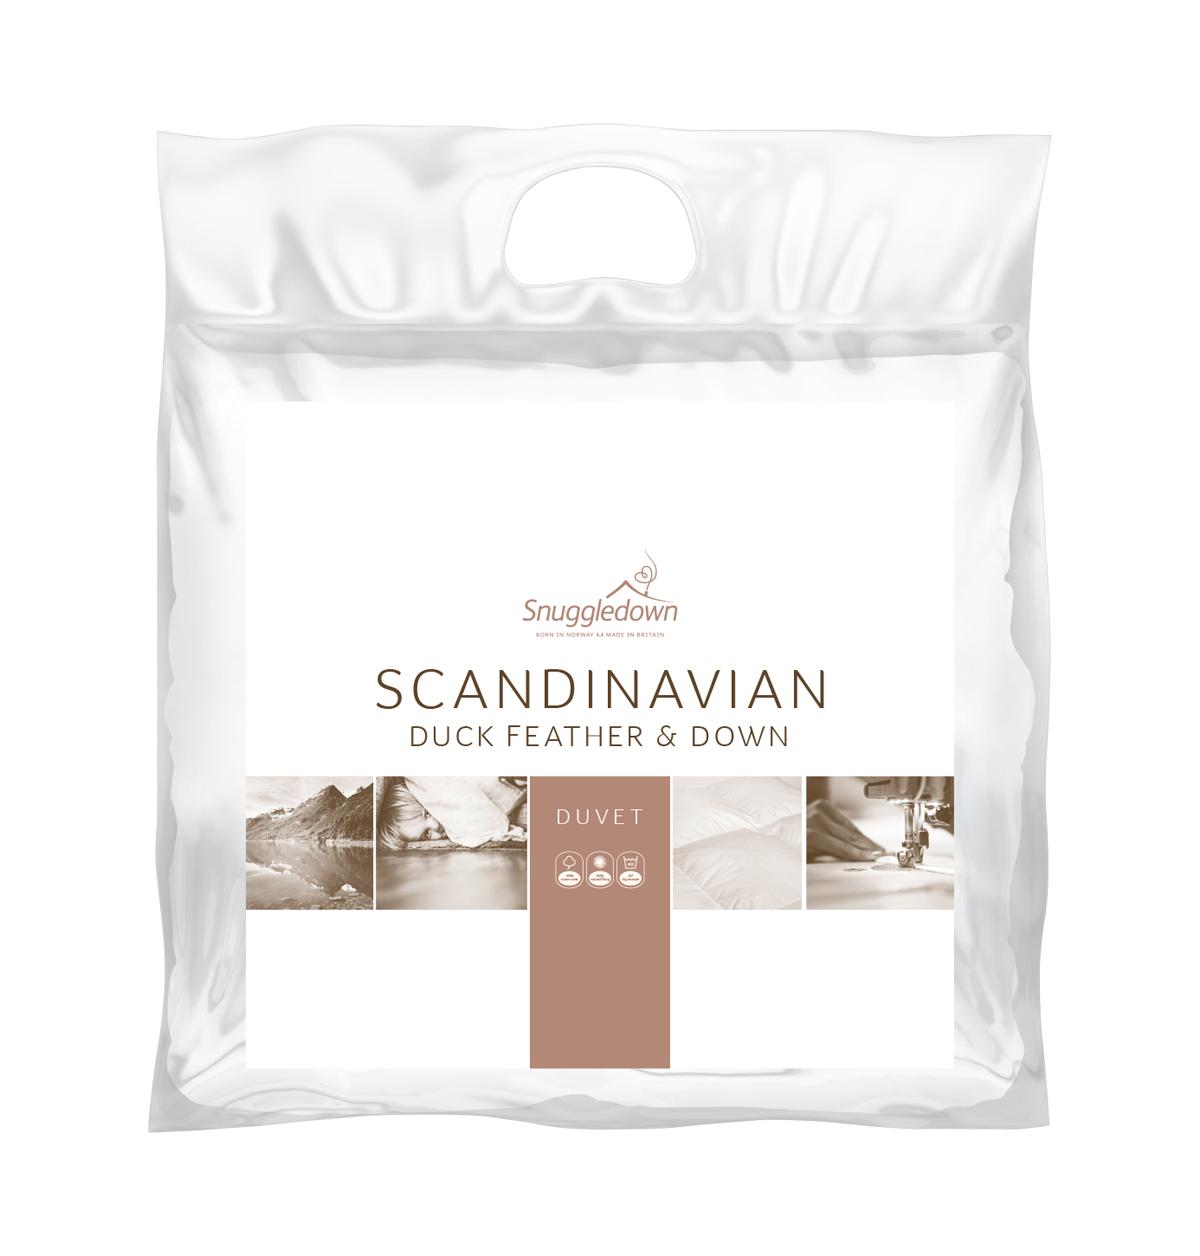 Snuggledown Scandinavian Duck Feather and Down 13.5 Tog Duvet eBay